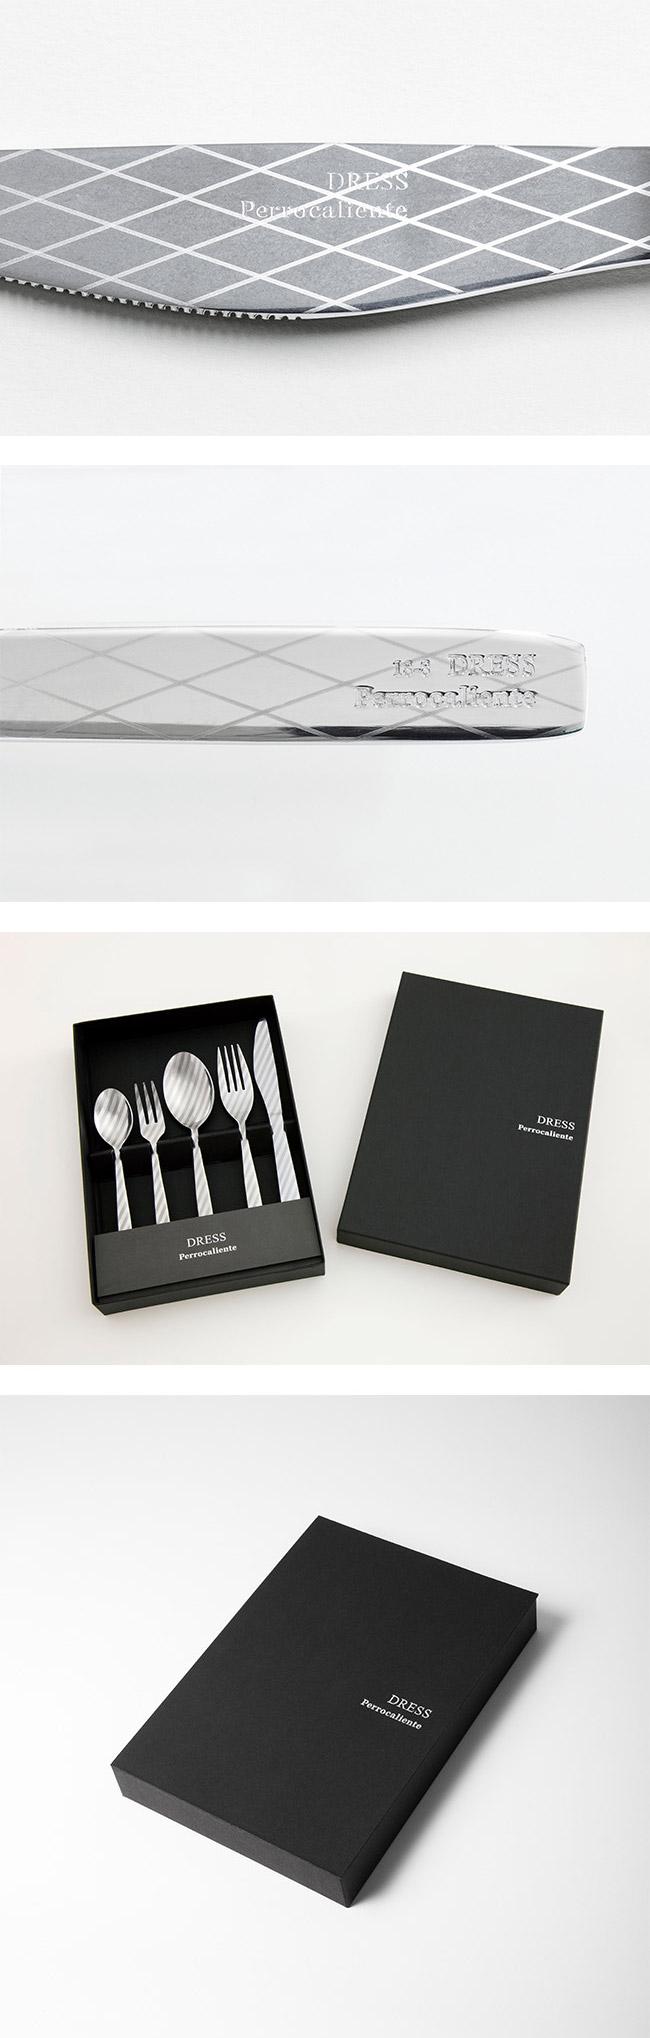 Perrocaliente Dress Gift Set 銀色盒裝餐具組 兩對組 網狀菱格 (湯匙*2+叉子*2)